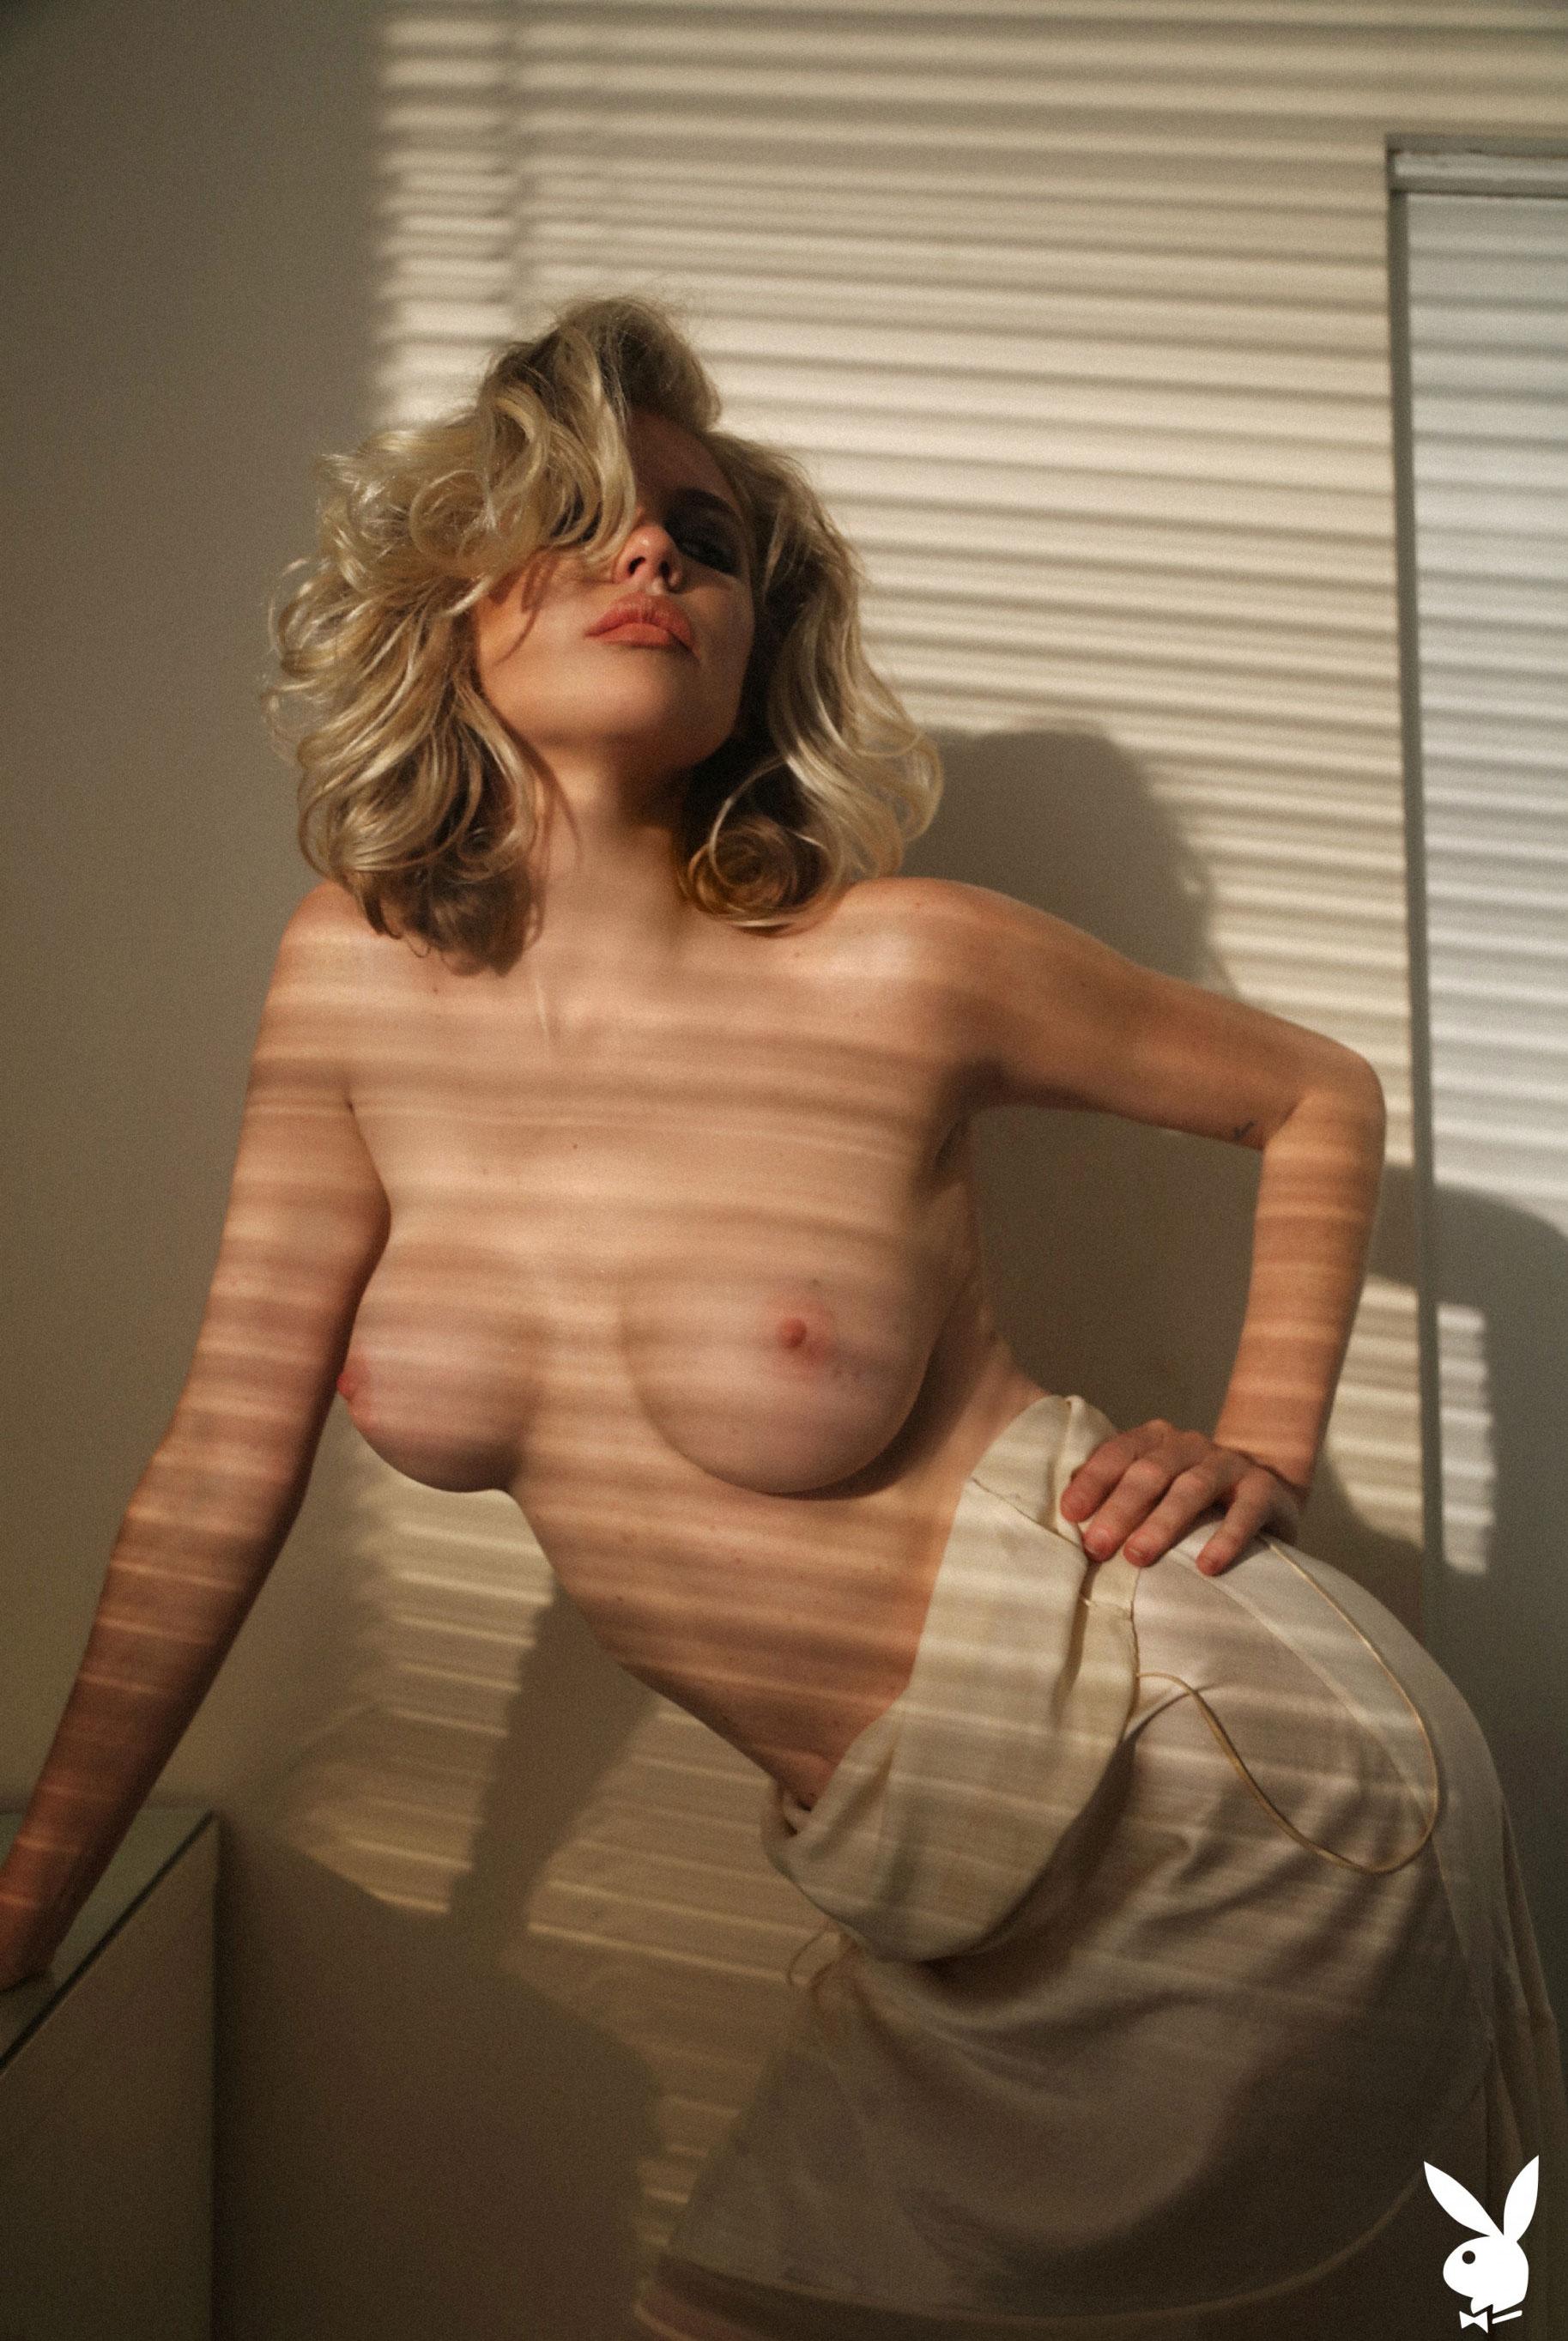 olivia-collins-playboy-nude-fucking-a-brazilian-girls-ass